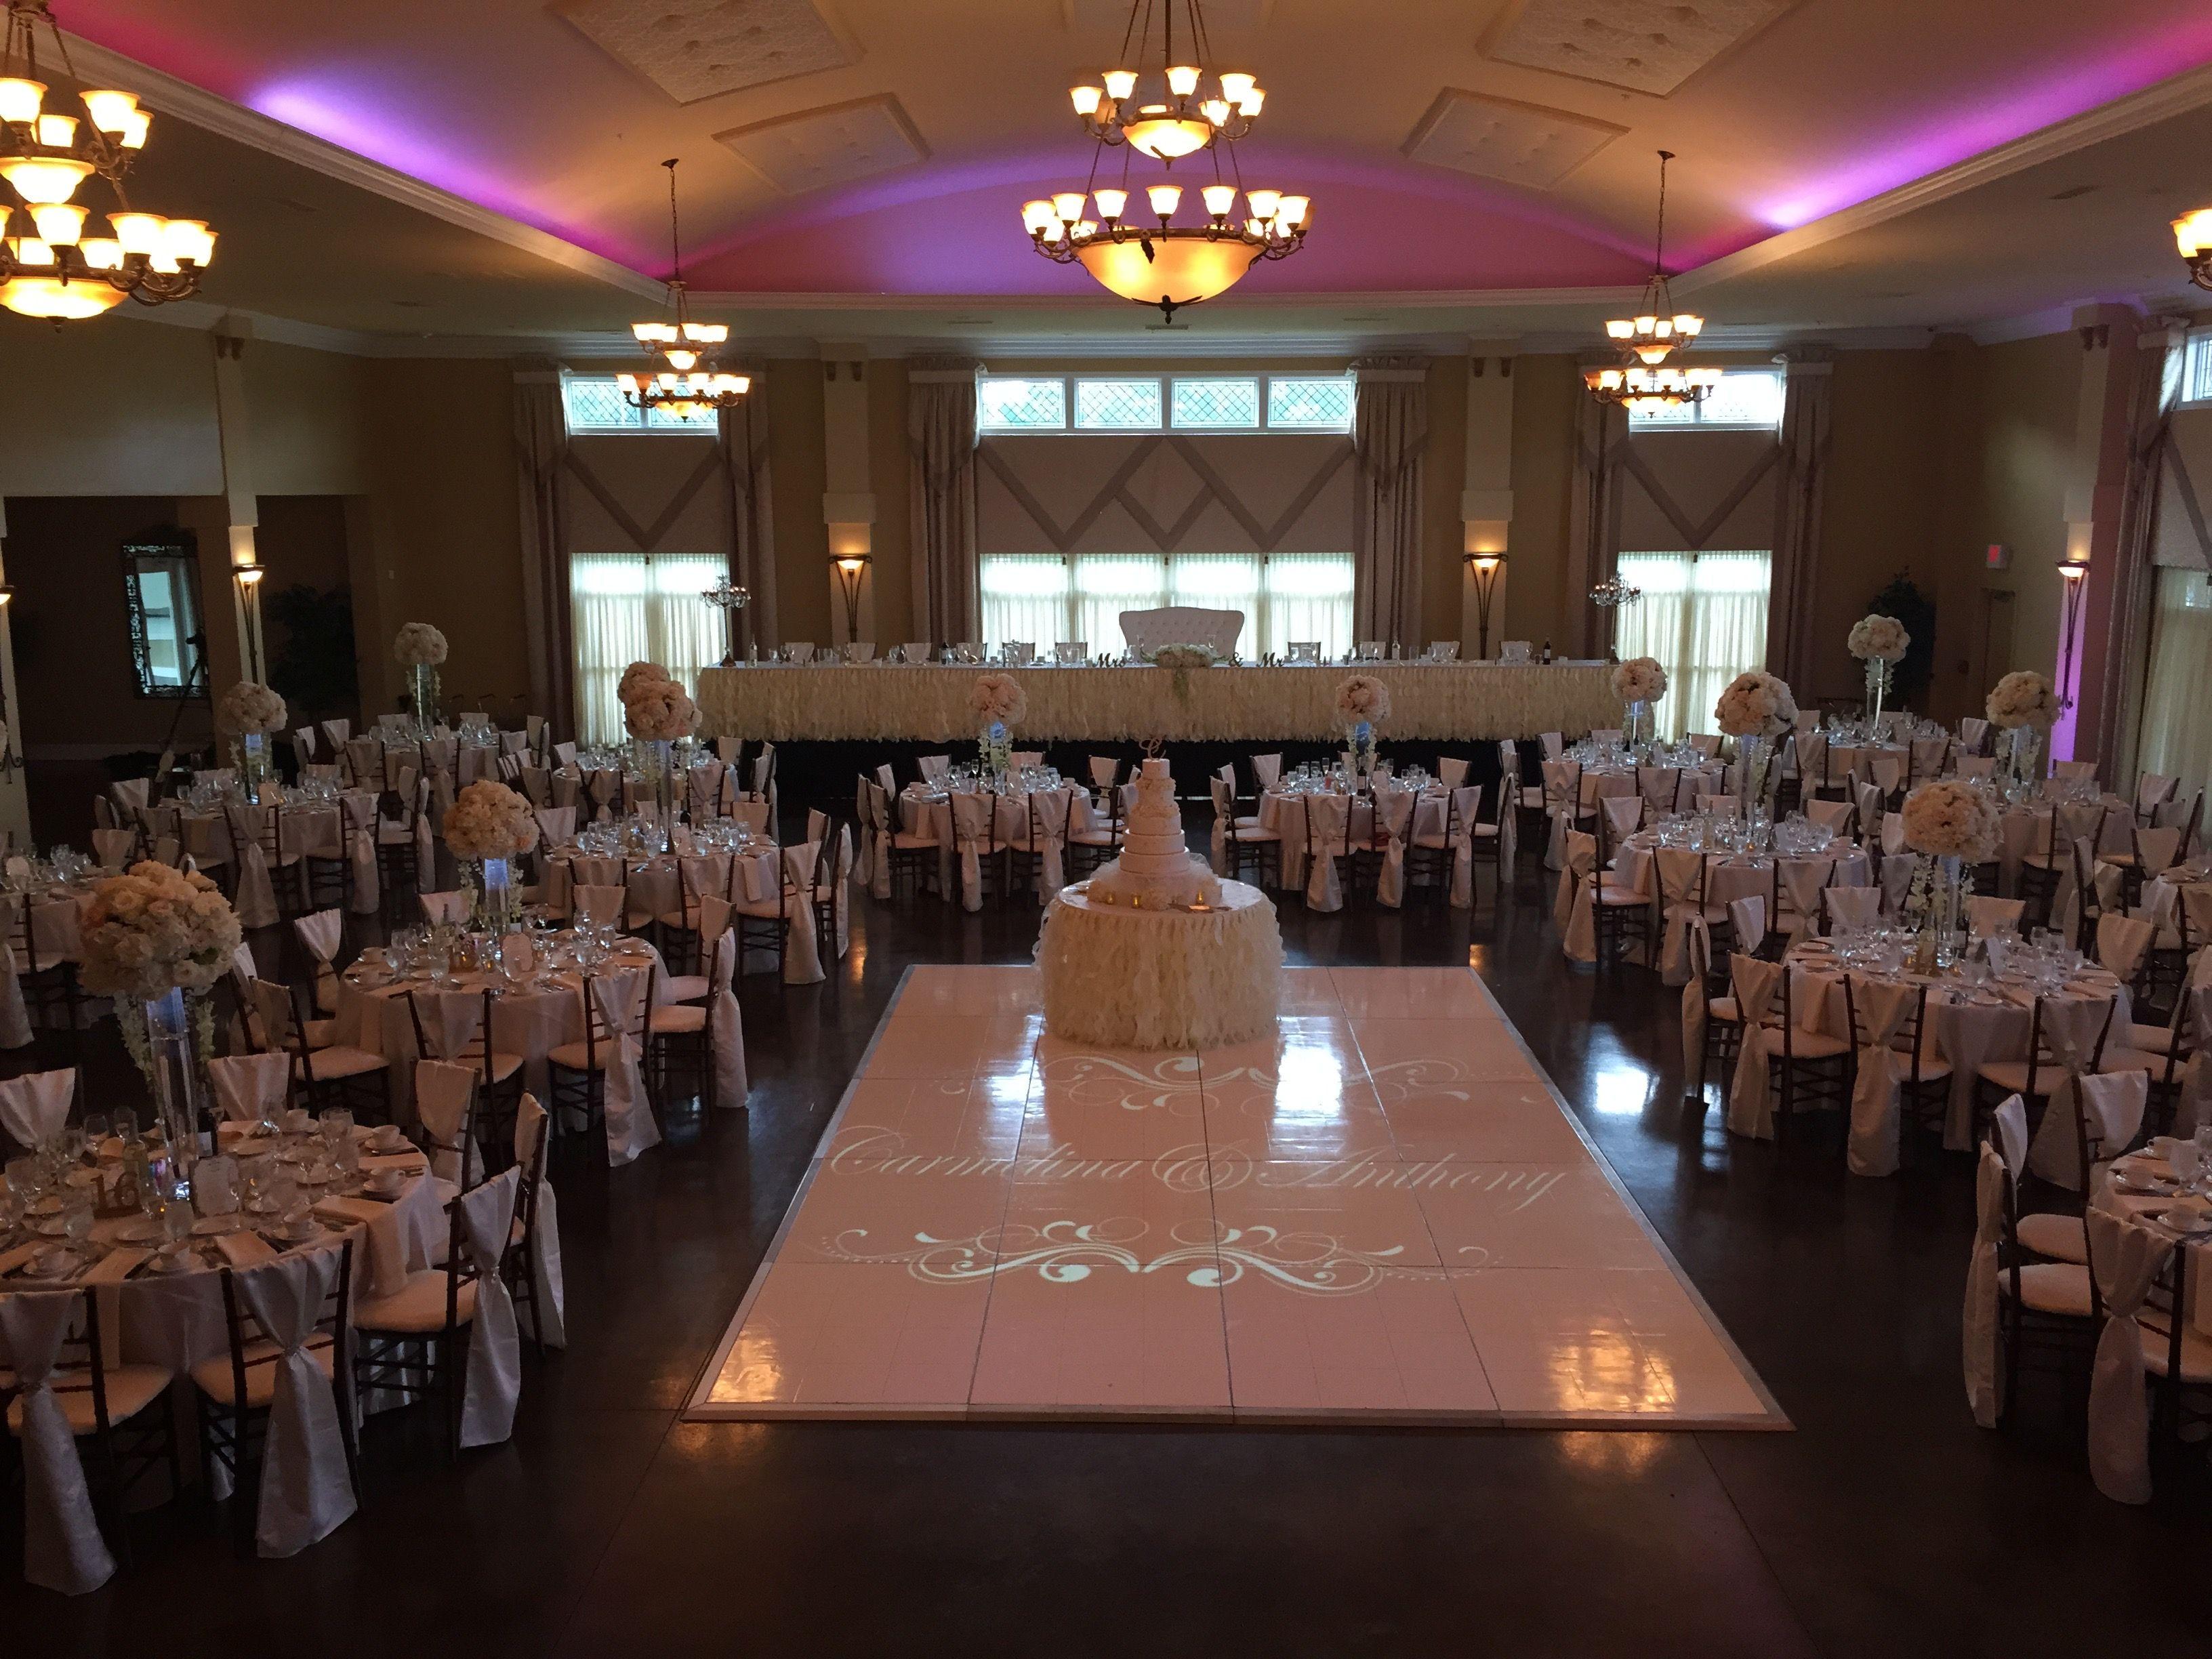 Elegant Wedding In The Amore Grand Ballroom Whitedancefloor Avantimansion Avantimansionballro Outdoor Wedding Venues Elegant Wedding Venues Wedding Venues